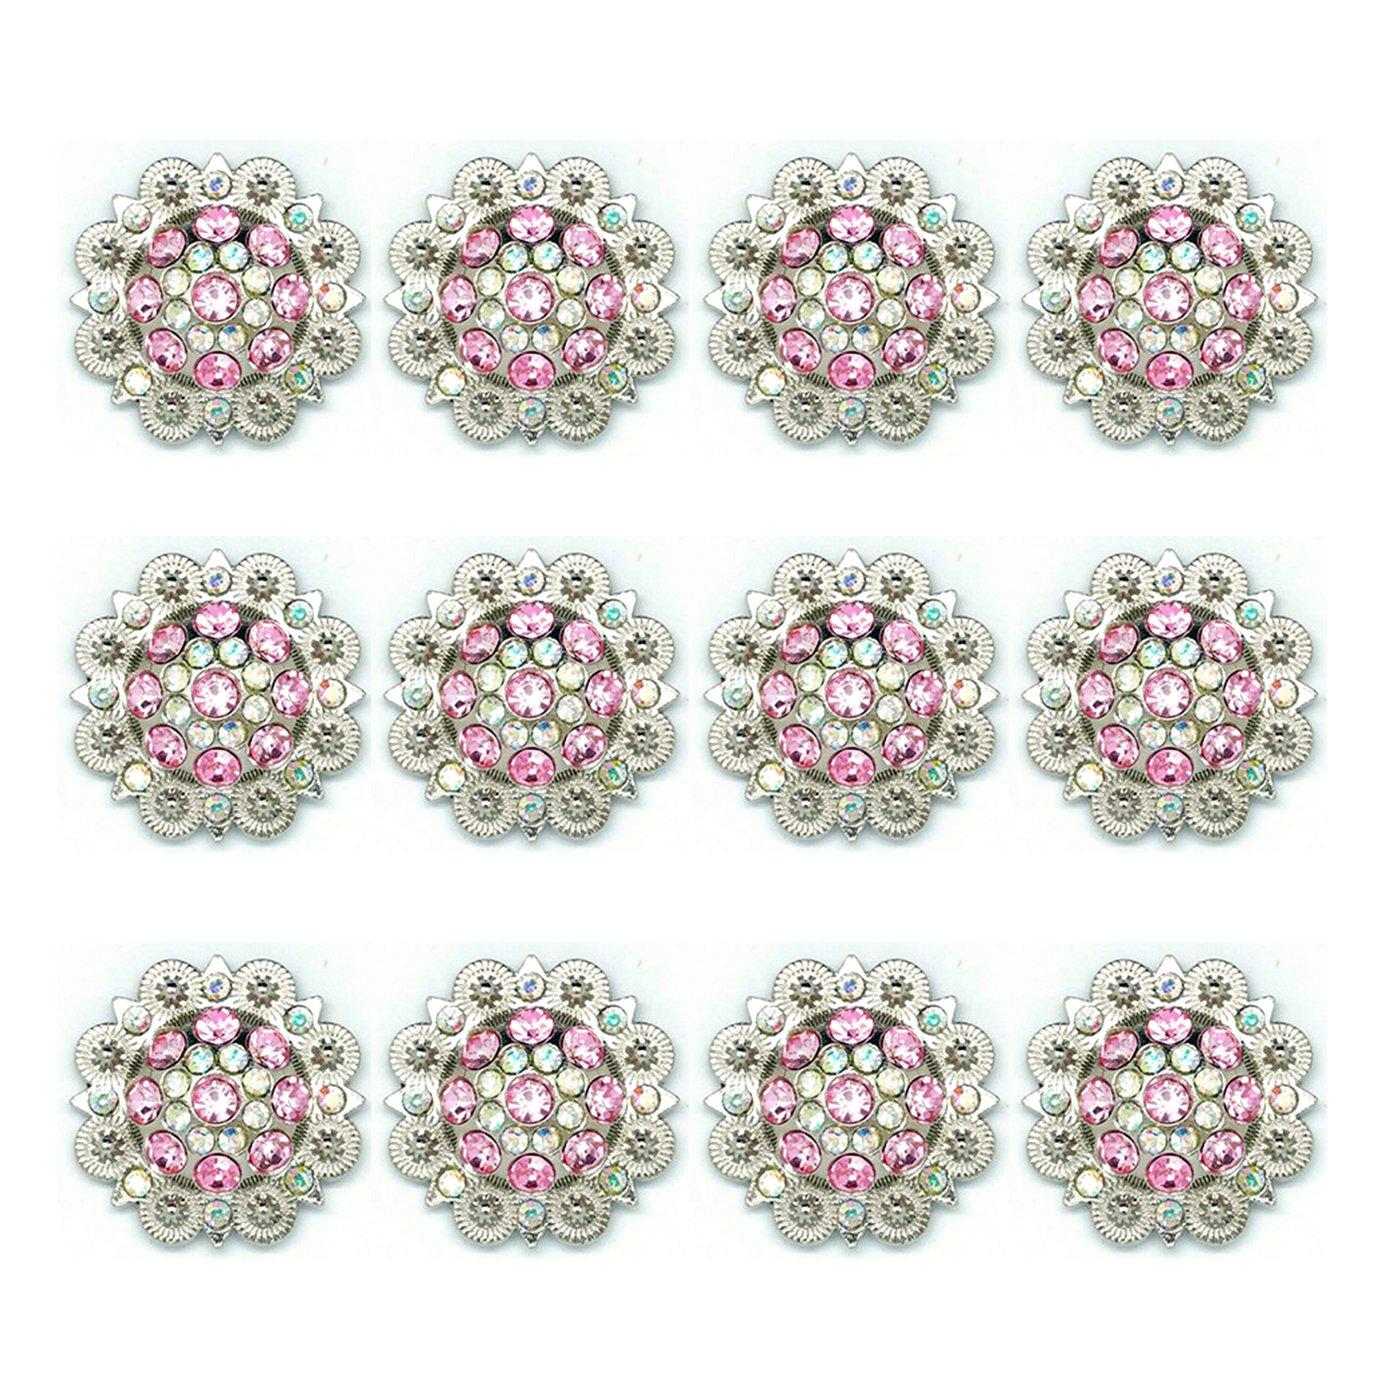 Rhinestone Covered Screwback Filigree Flower Bling Conchos